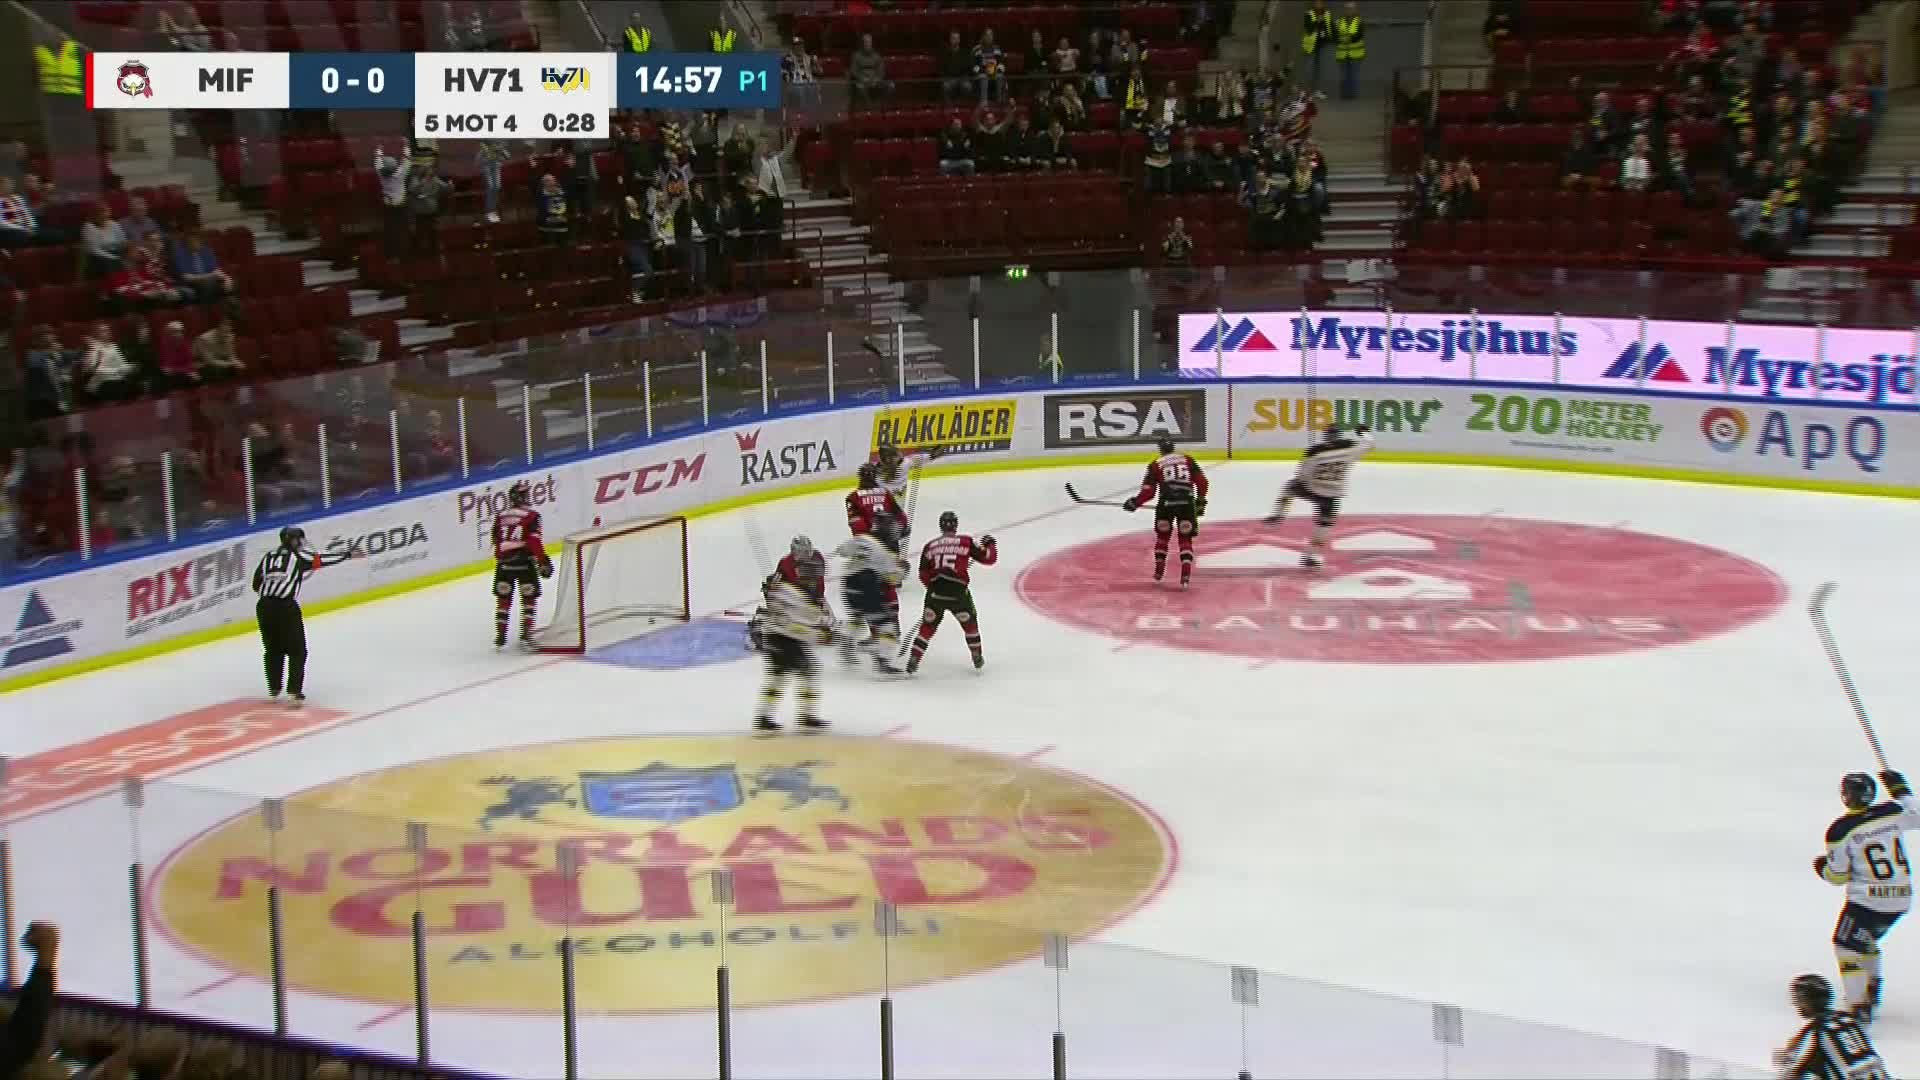 Malmö Redhawks - HV71 0-1